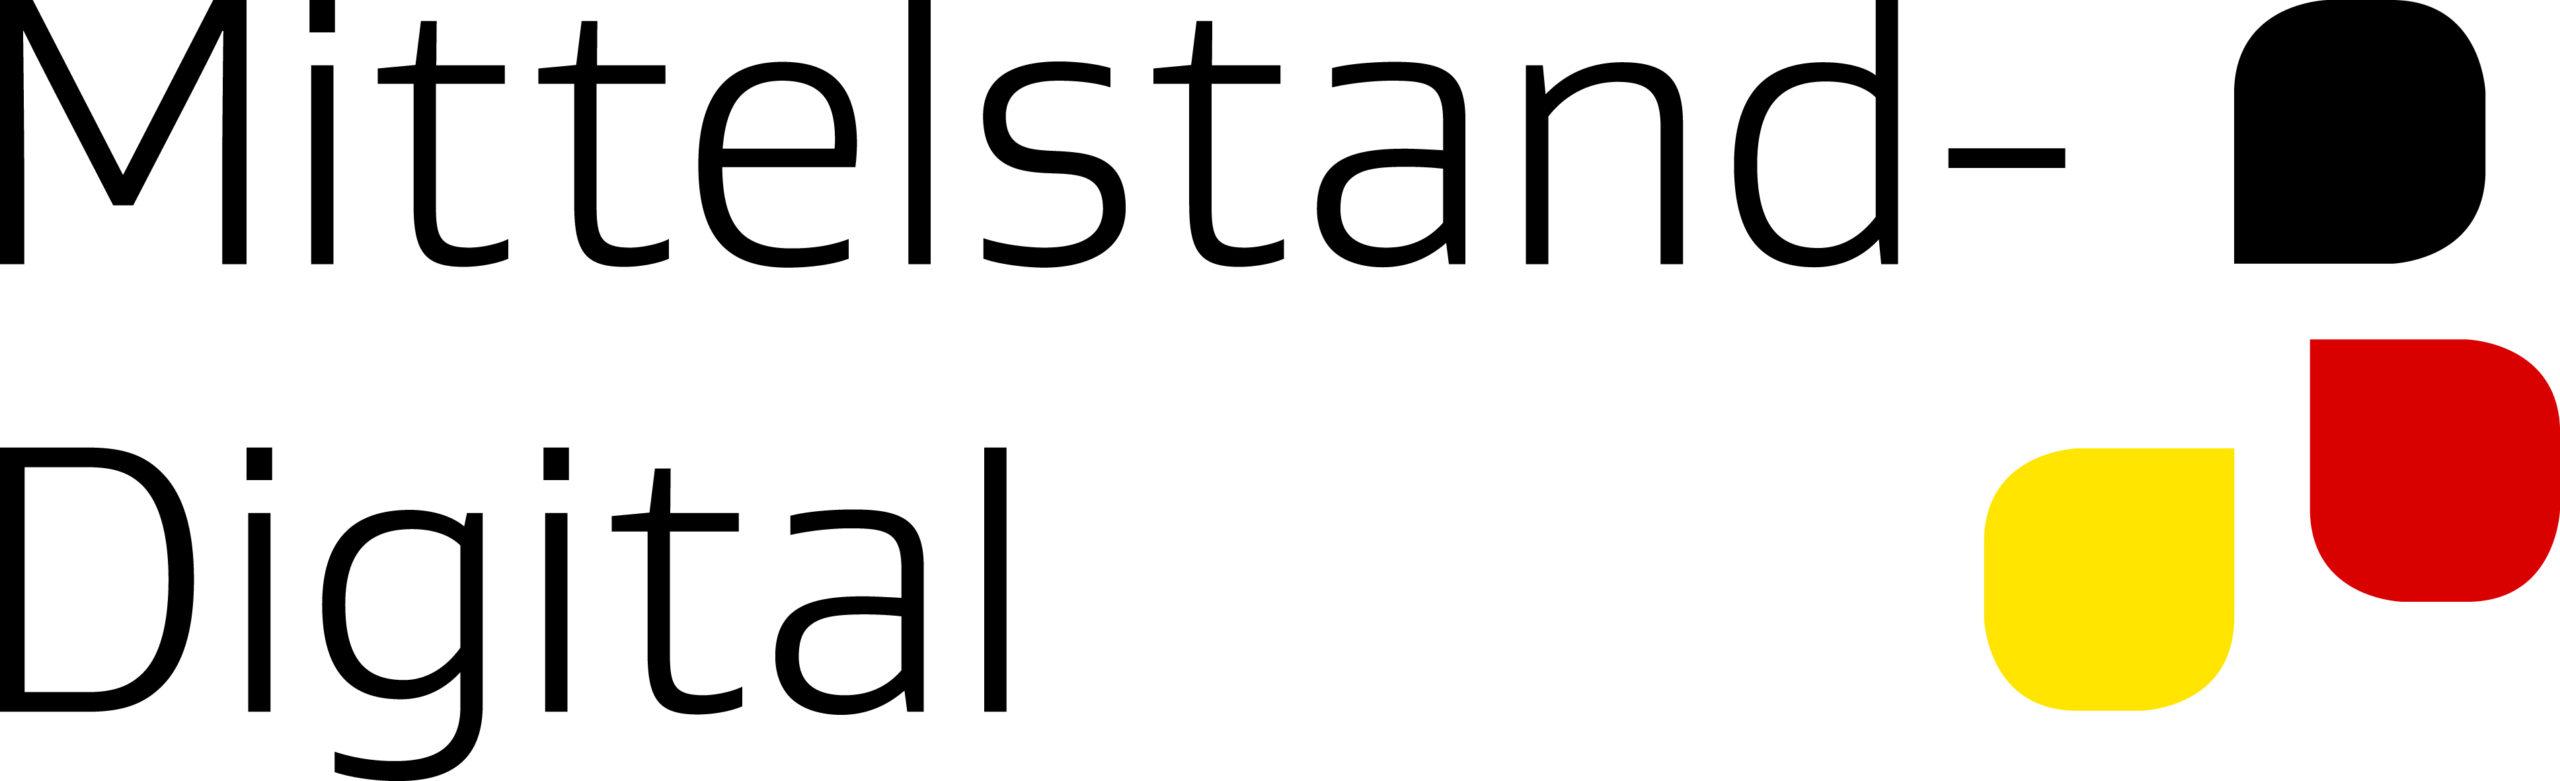 Mittelstand Digital